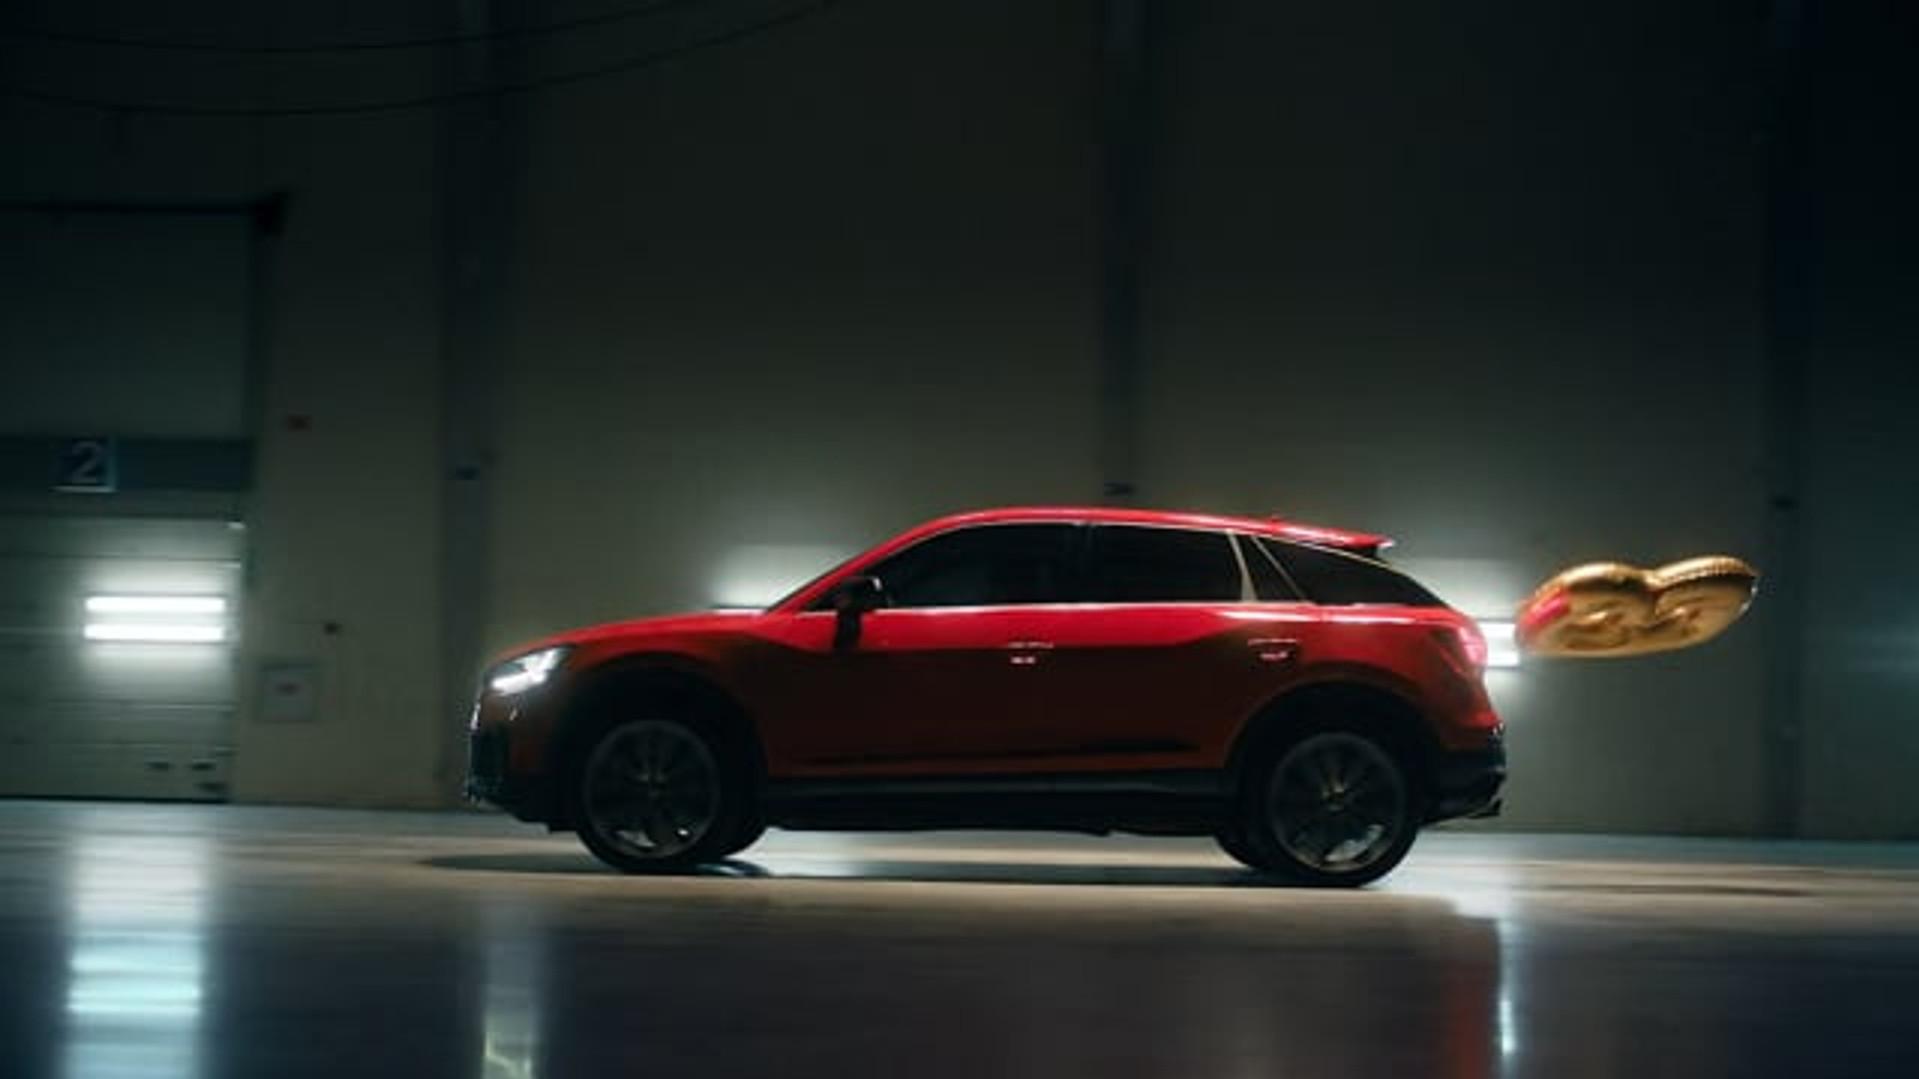 Audi - Celebrating the Speed of life